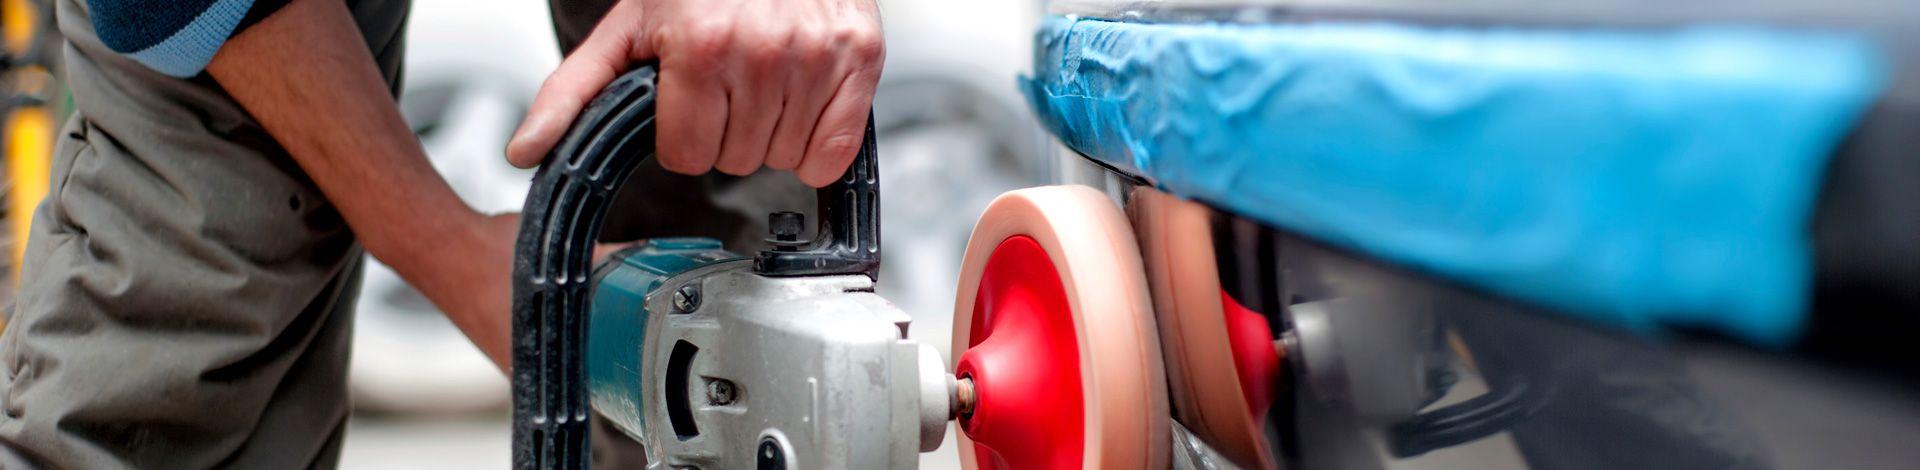 Auto Detailing Training Automotive equipment Car